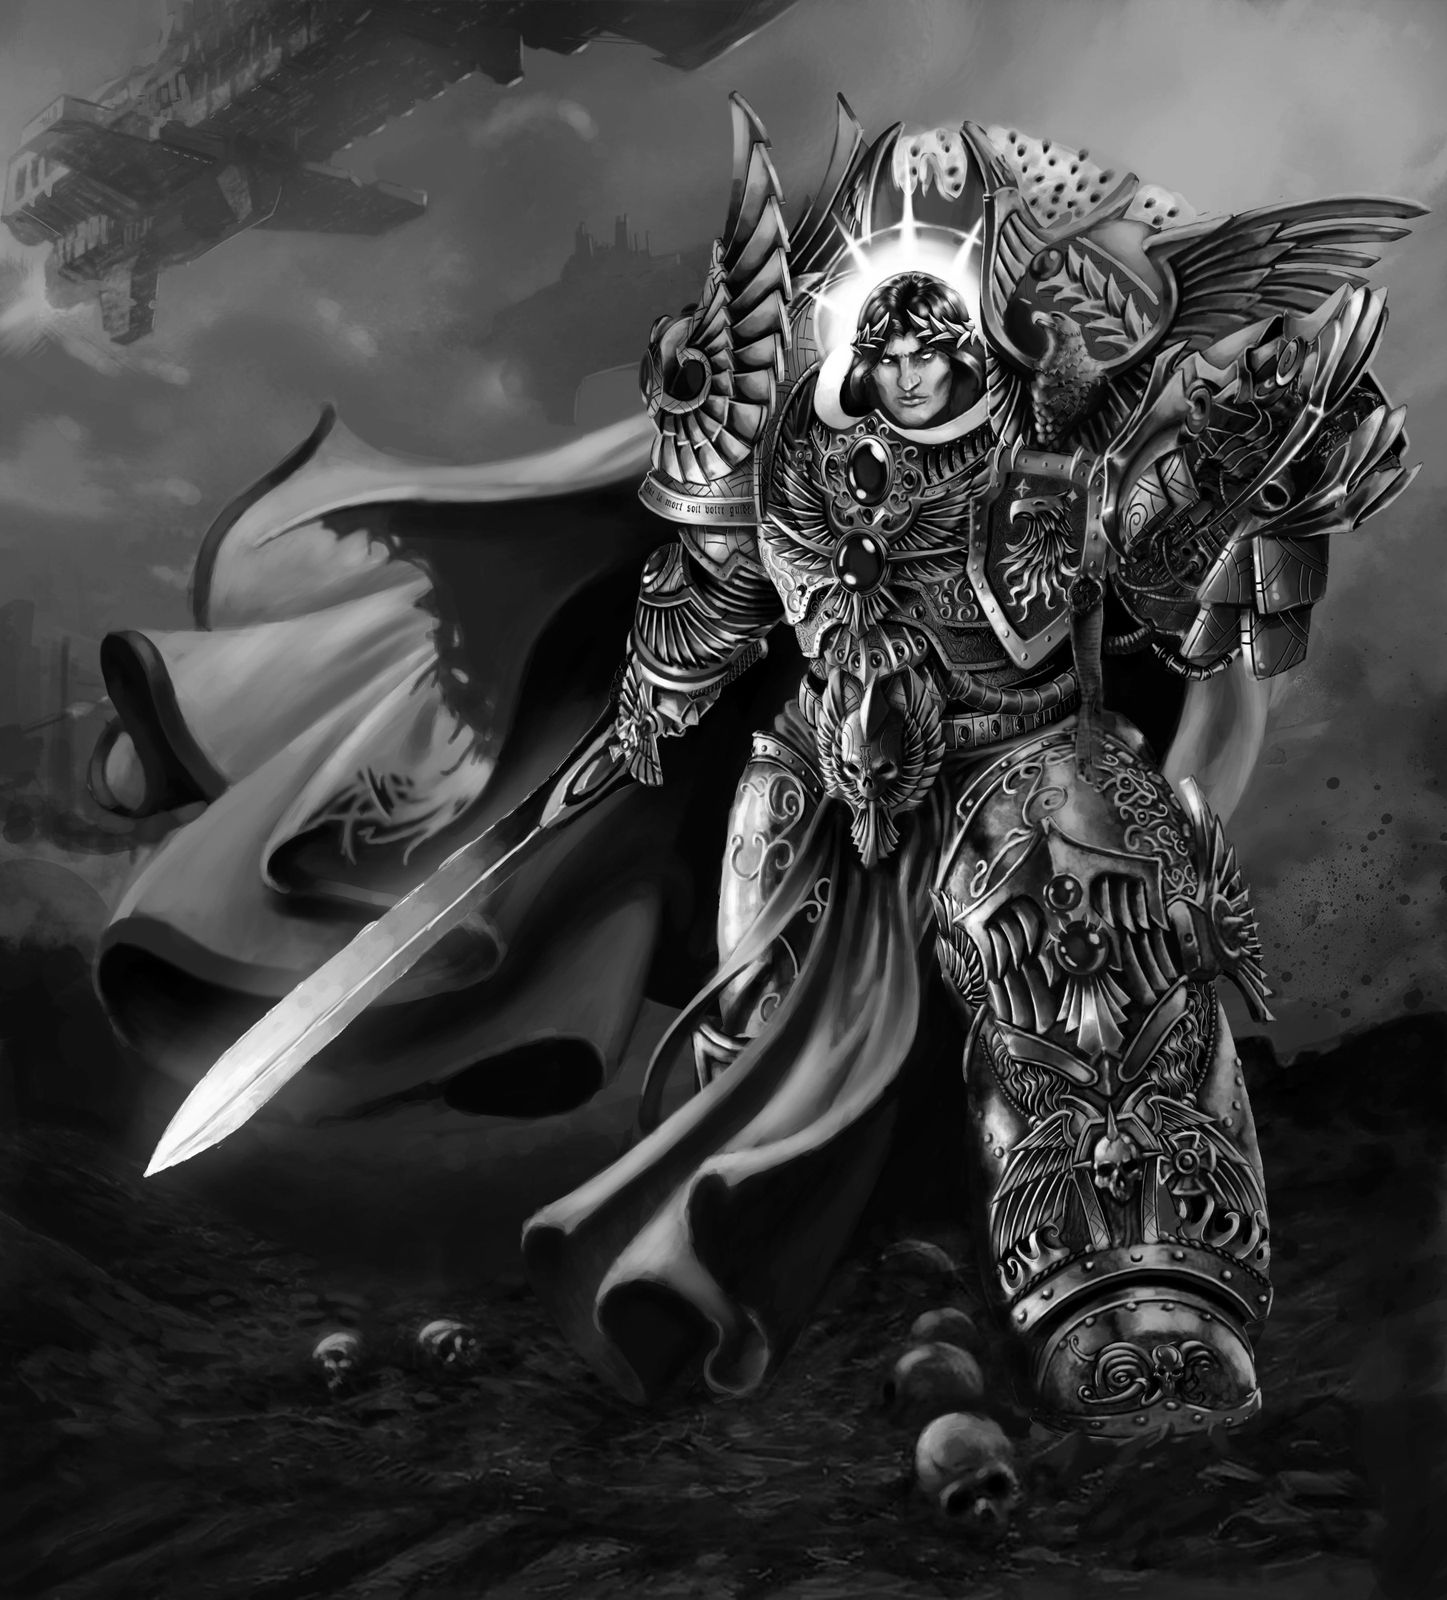 [W30K] L'Empereur de l'Humanité / The Emperor of Mankind Empereur-dieu-10